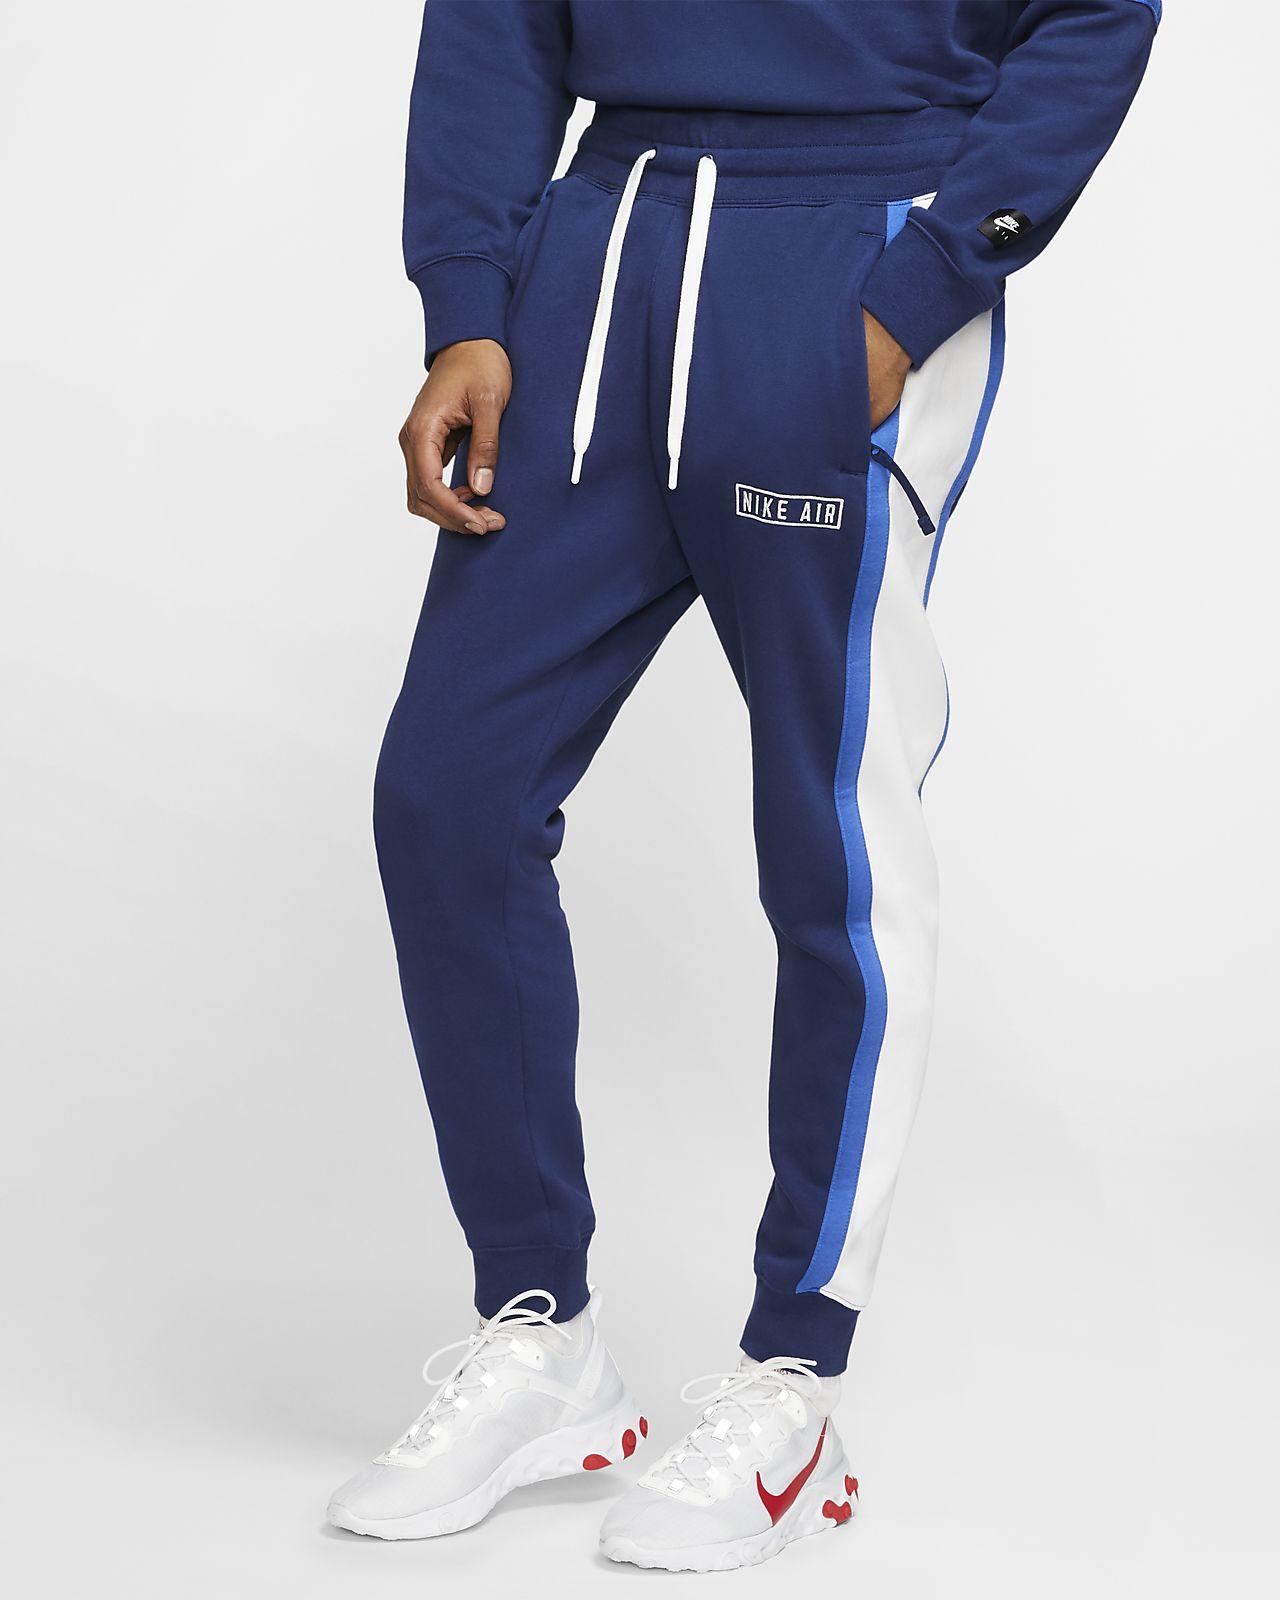 Pantaloni in fleece Nike Air - Uomo